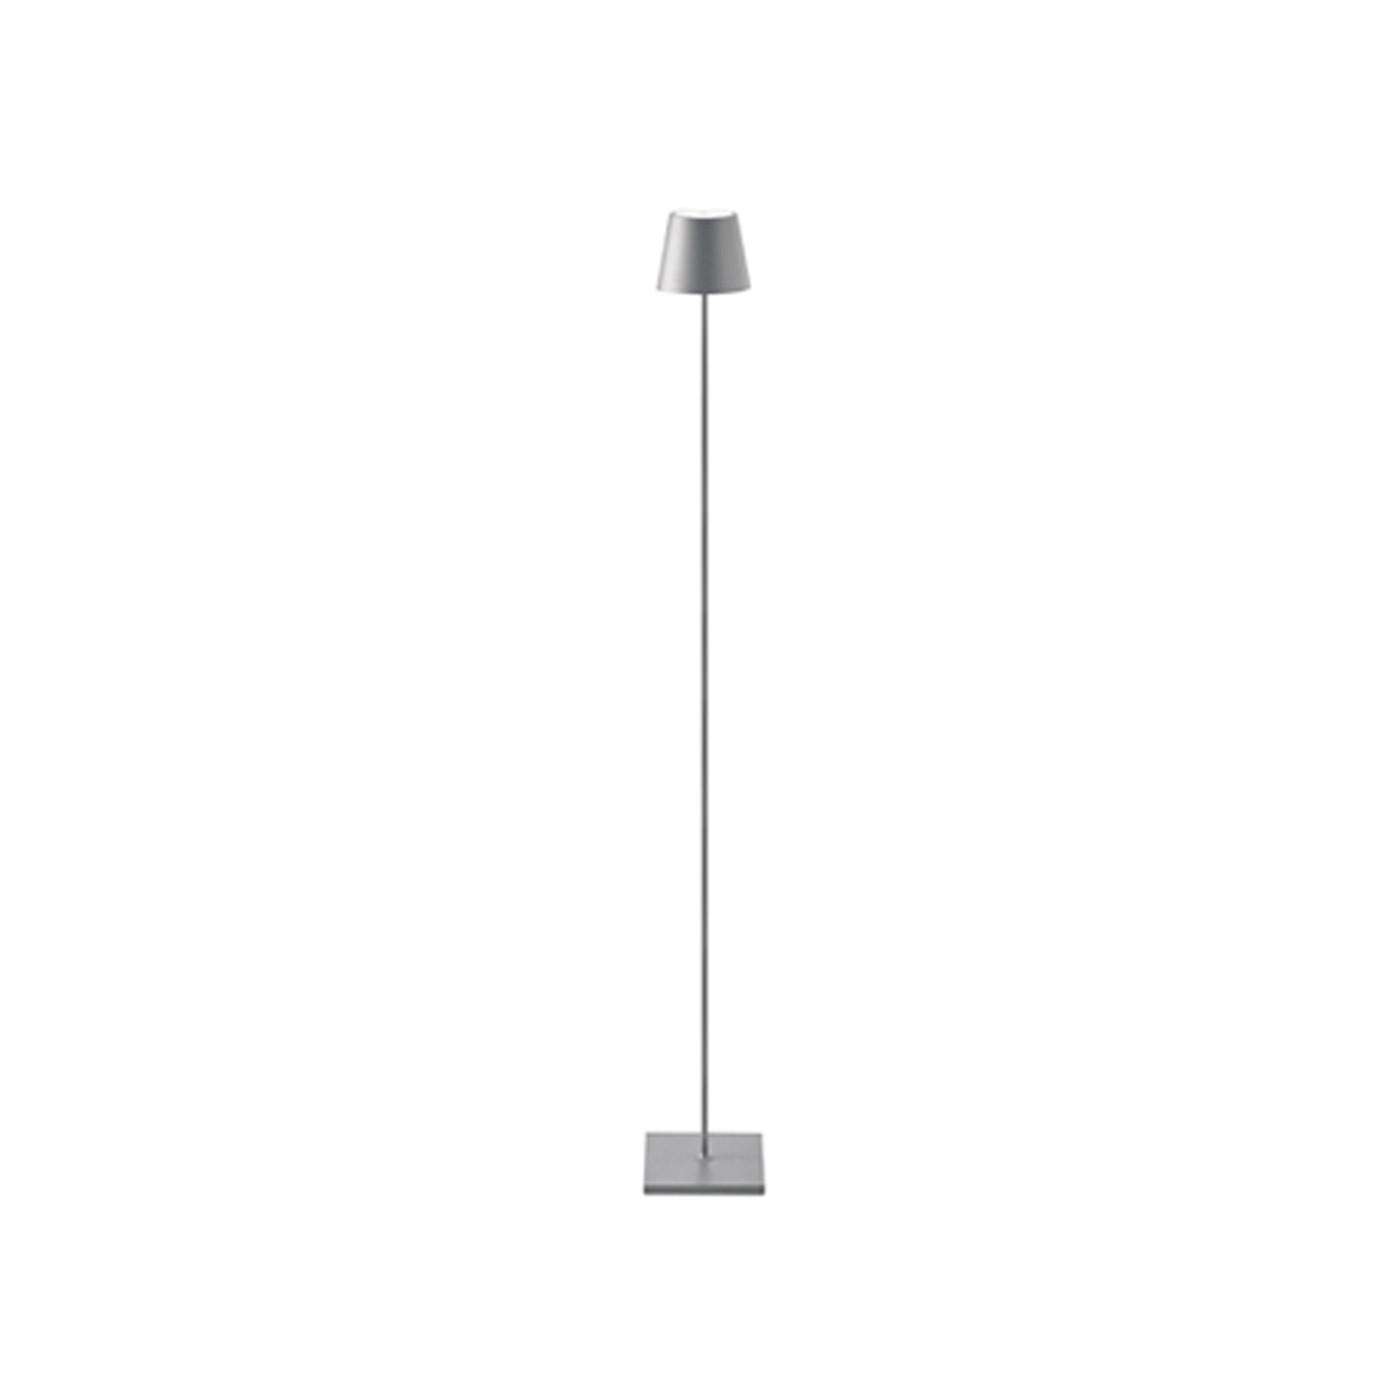 Sigor Licht Nuin Battery Floor Lamp